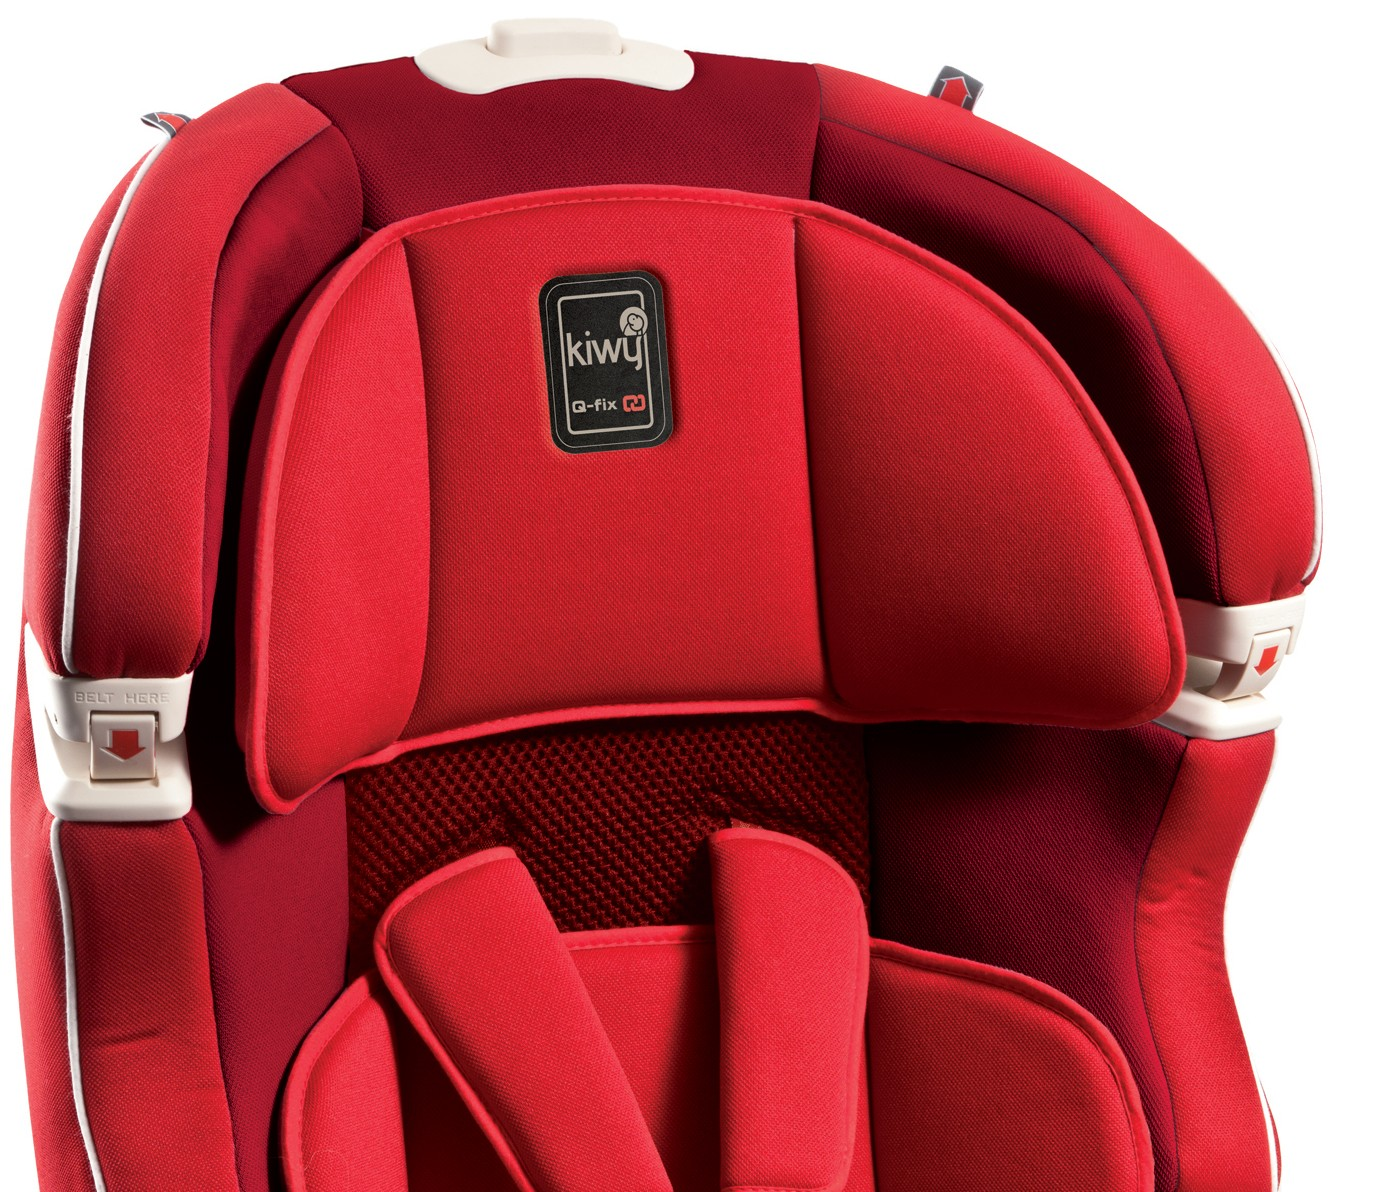 babytop24 kiwy autositz slf123 mit q fix adapter f r isofix cherry. Black Bedroom Furniture Sets. Home Design Ideas